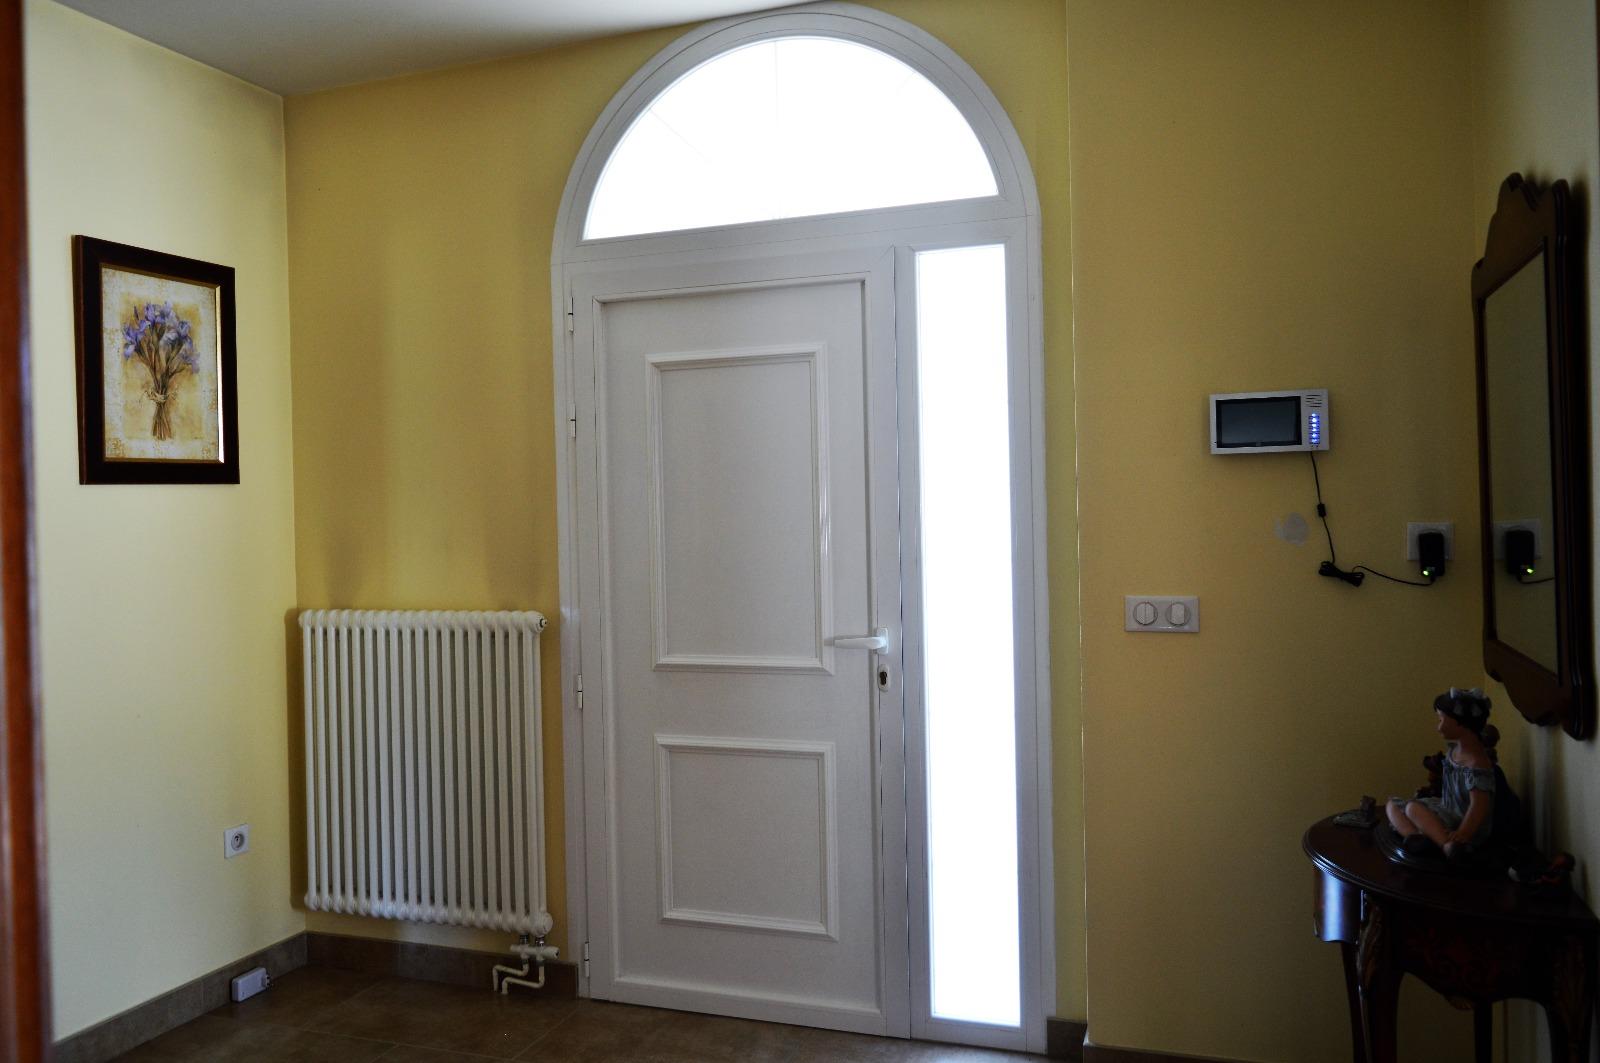 Saint girons maison recente comme neuve ma maison for Garage saint girons